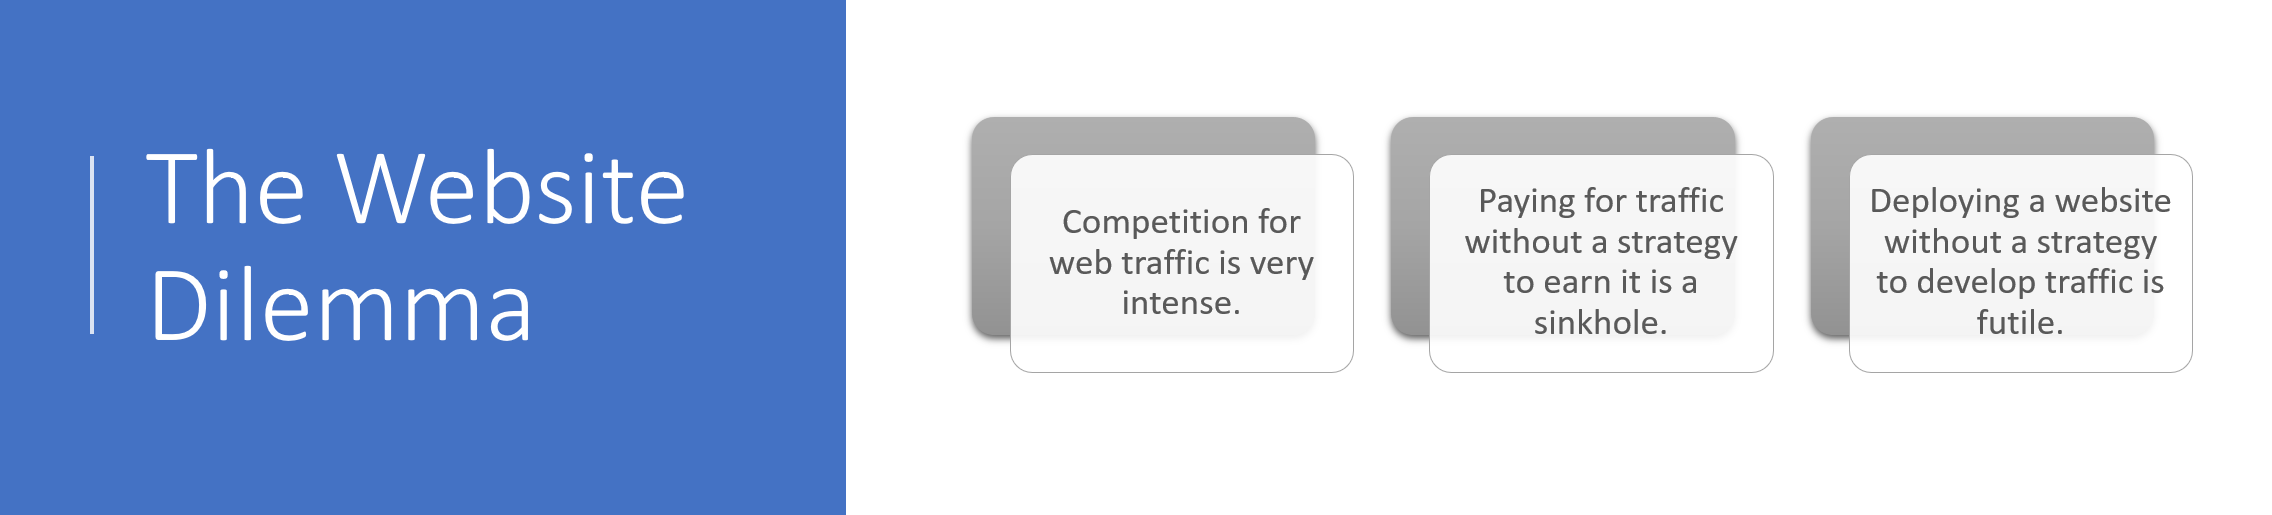 The Website Dilemma.png